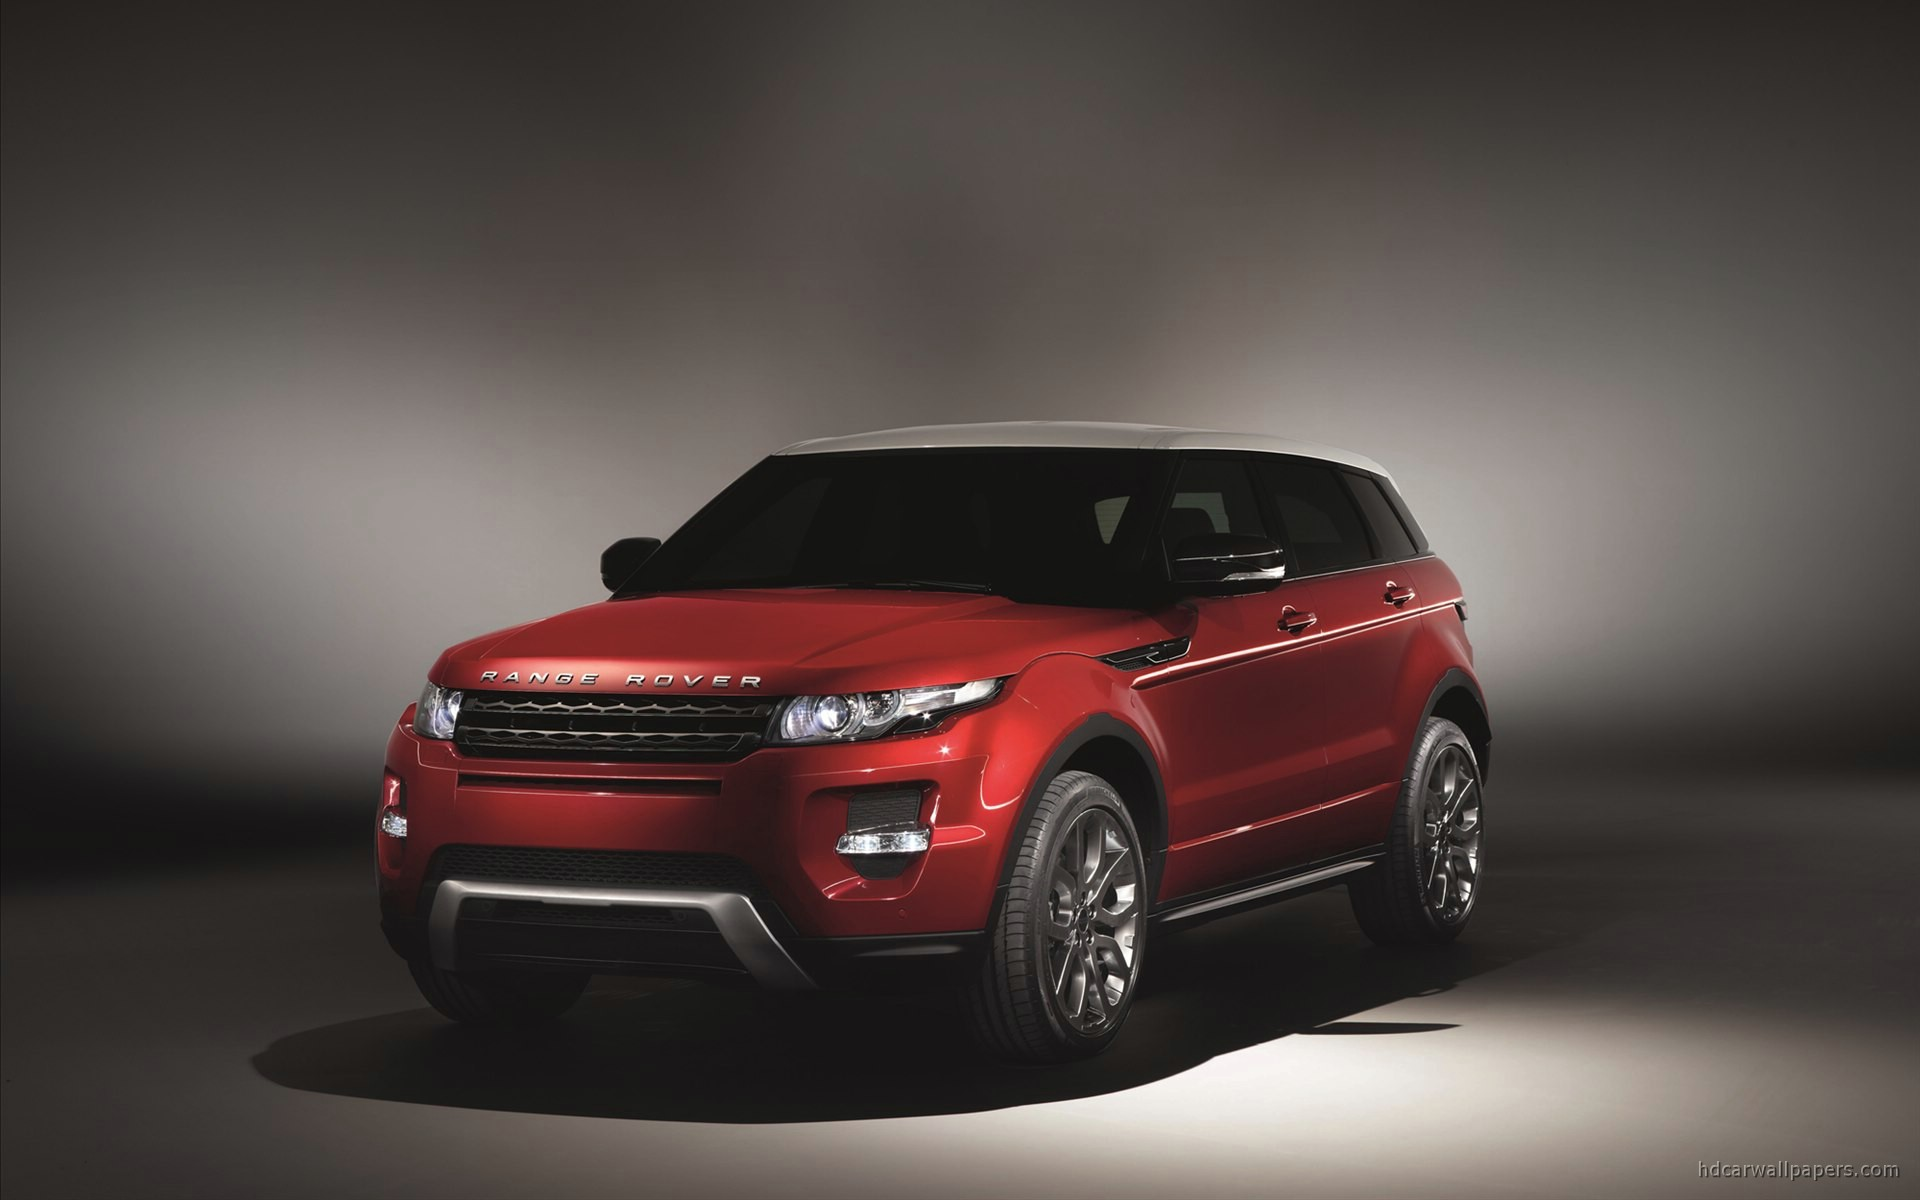 2012 range rover evoque wallpaper in 1920x1200 resolution. Black Bedroom Furniture Sets. Home Design Ideas